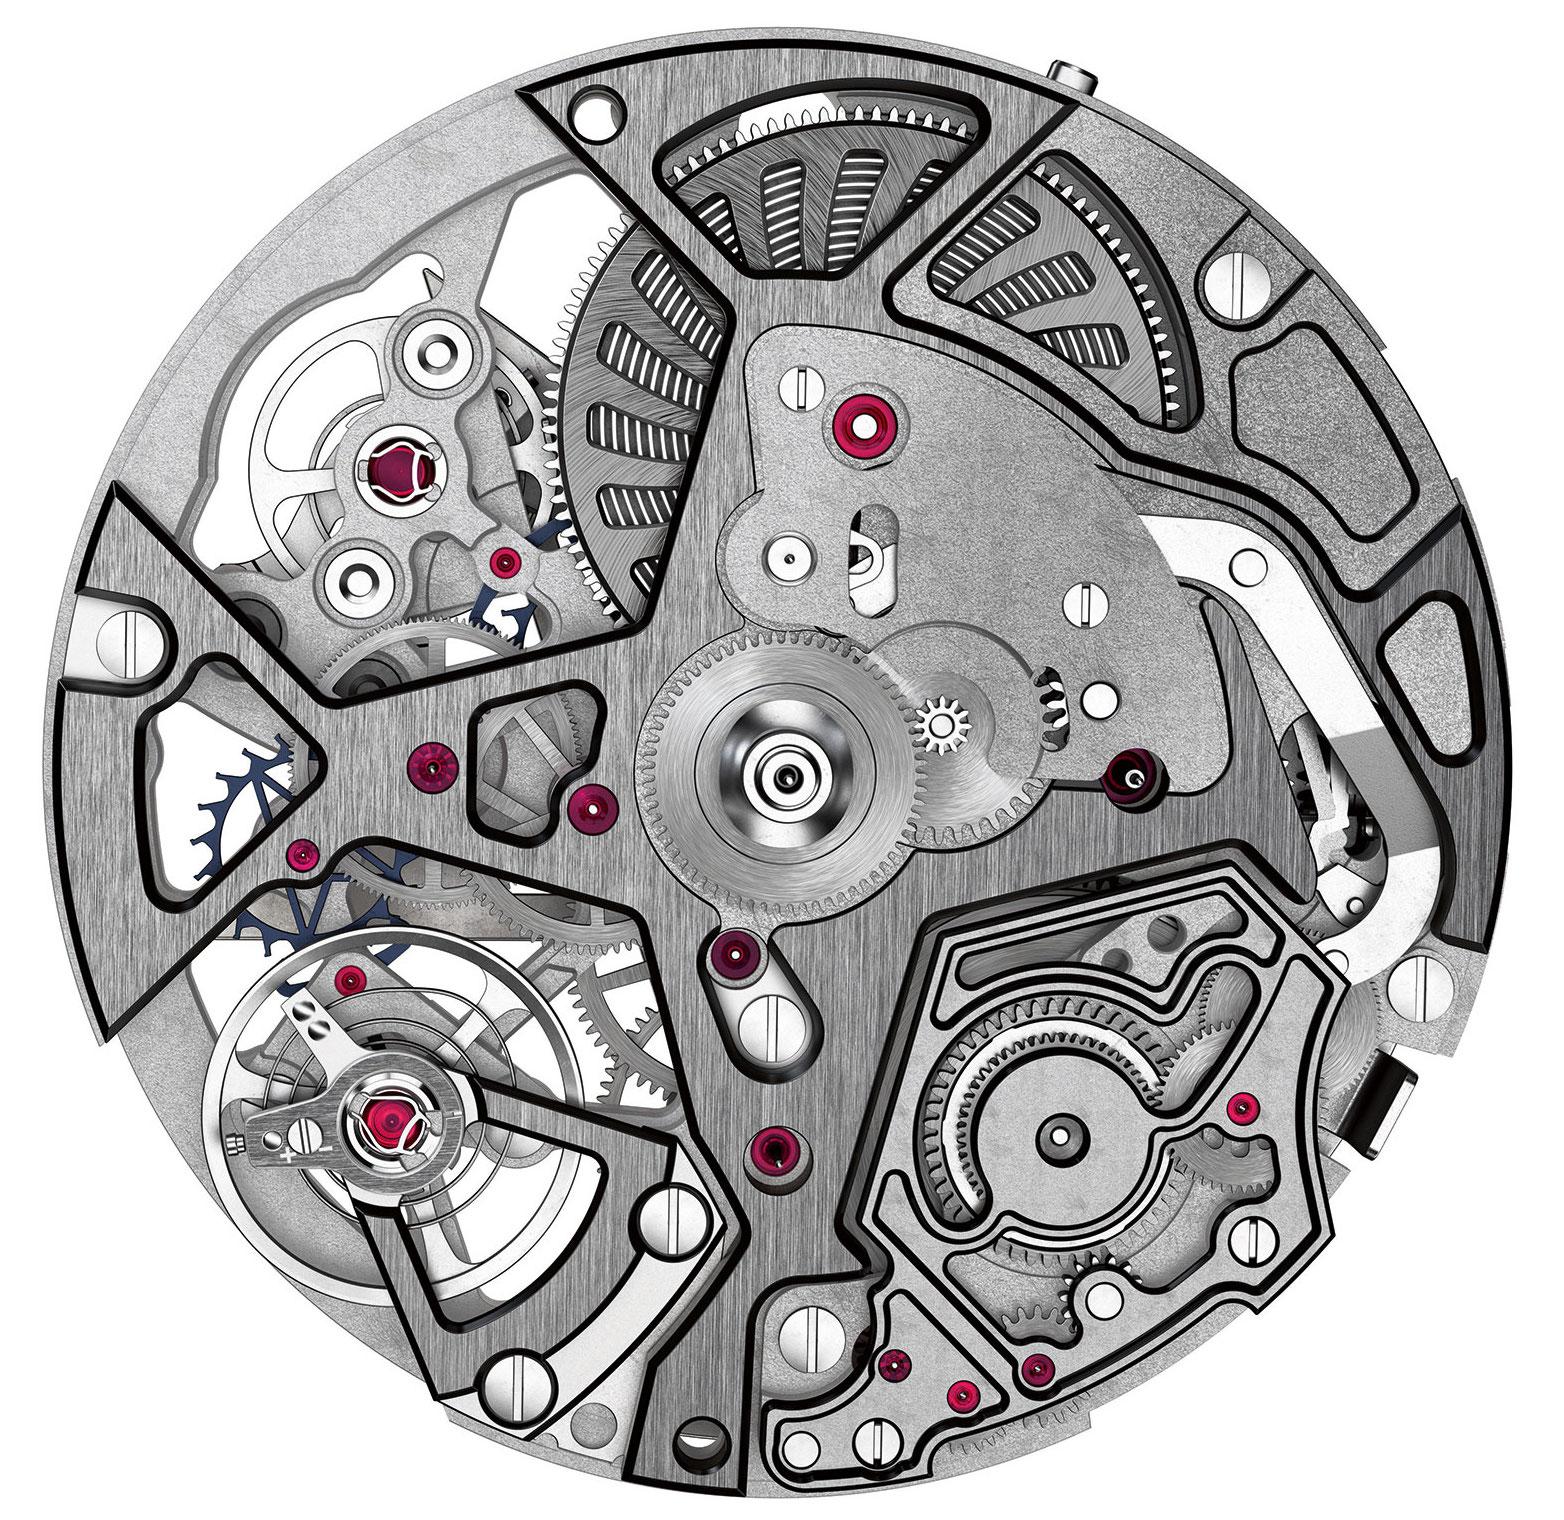 zenith-defy-el-primero-21-karora-luxusora-kronograf-svajci-ora-orasblog-10.jpg